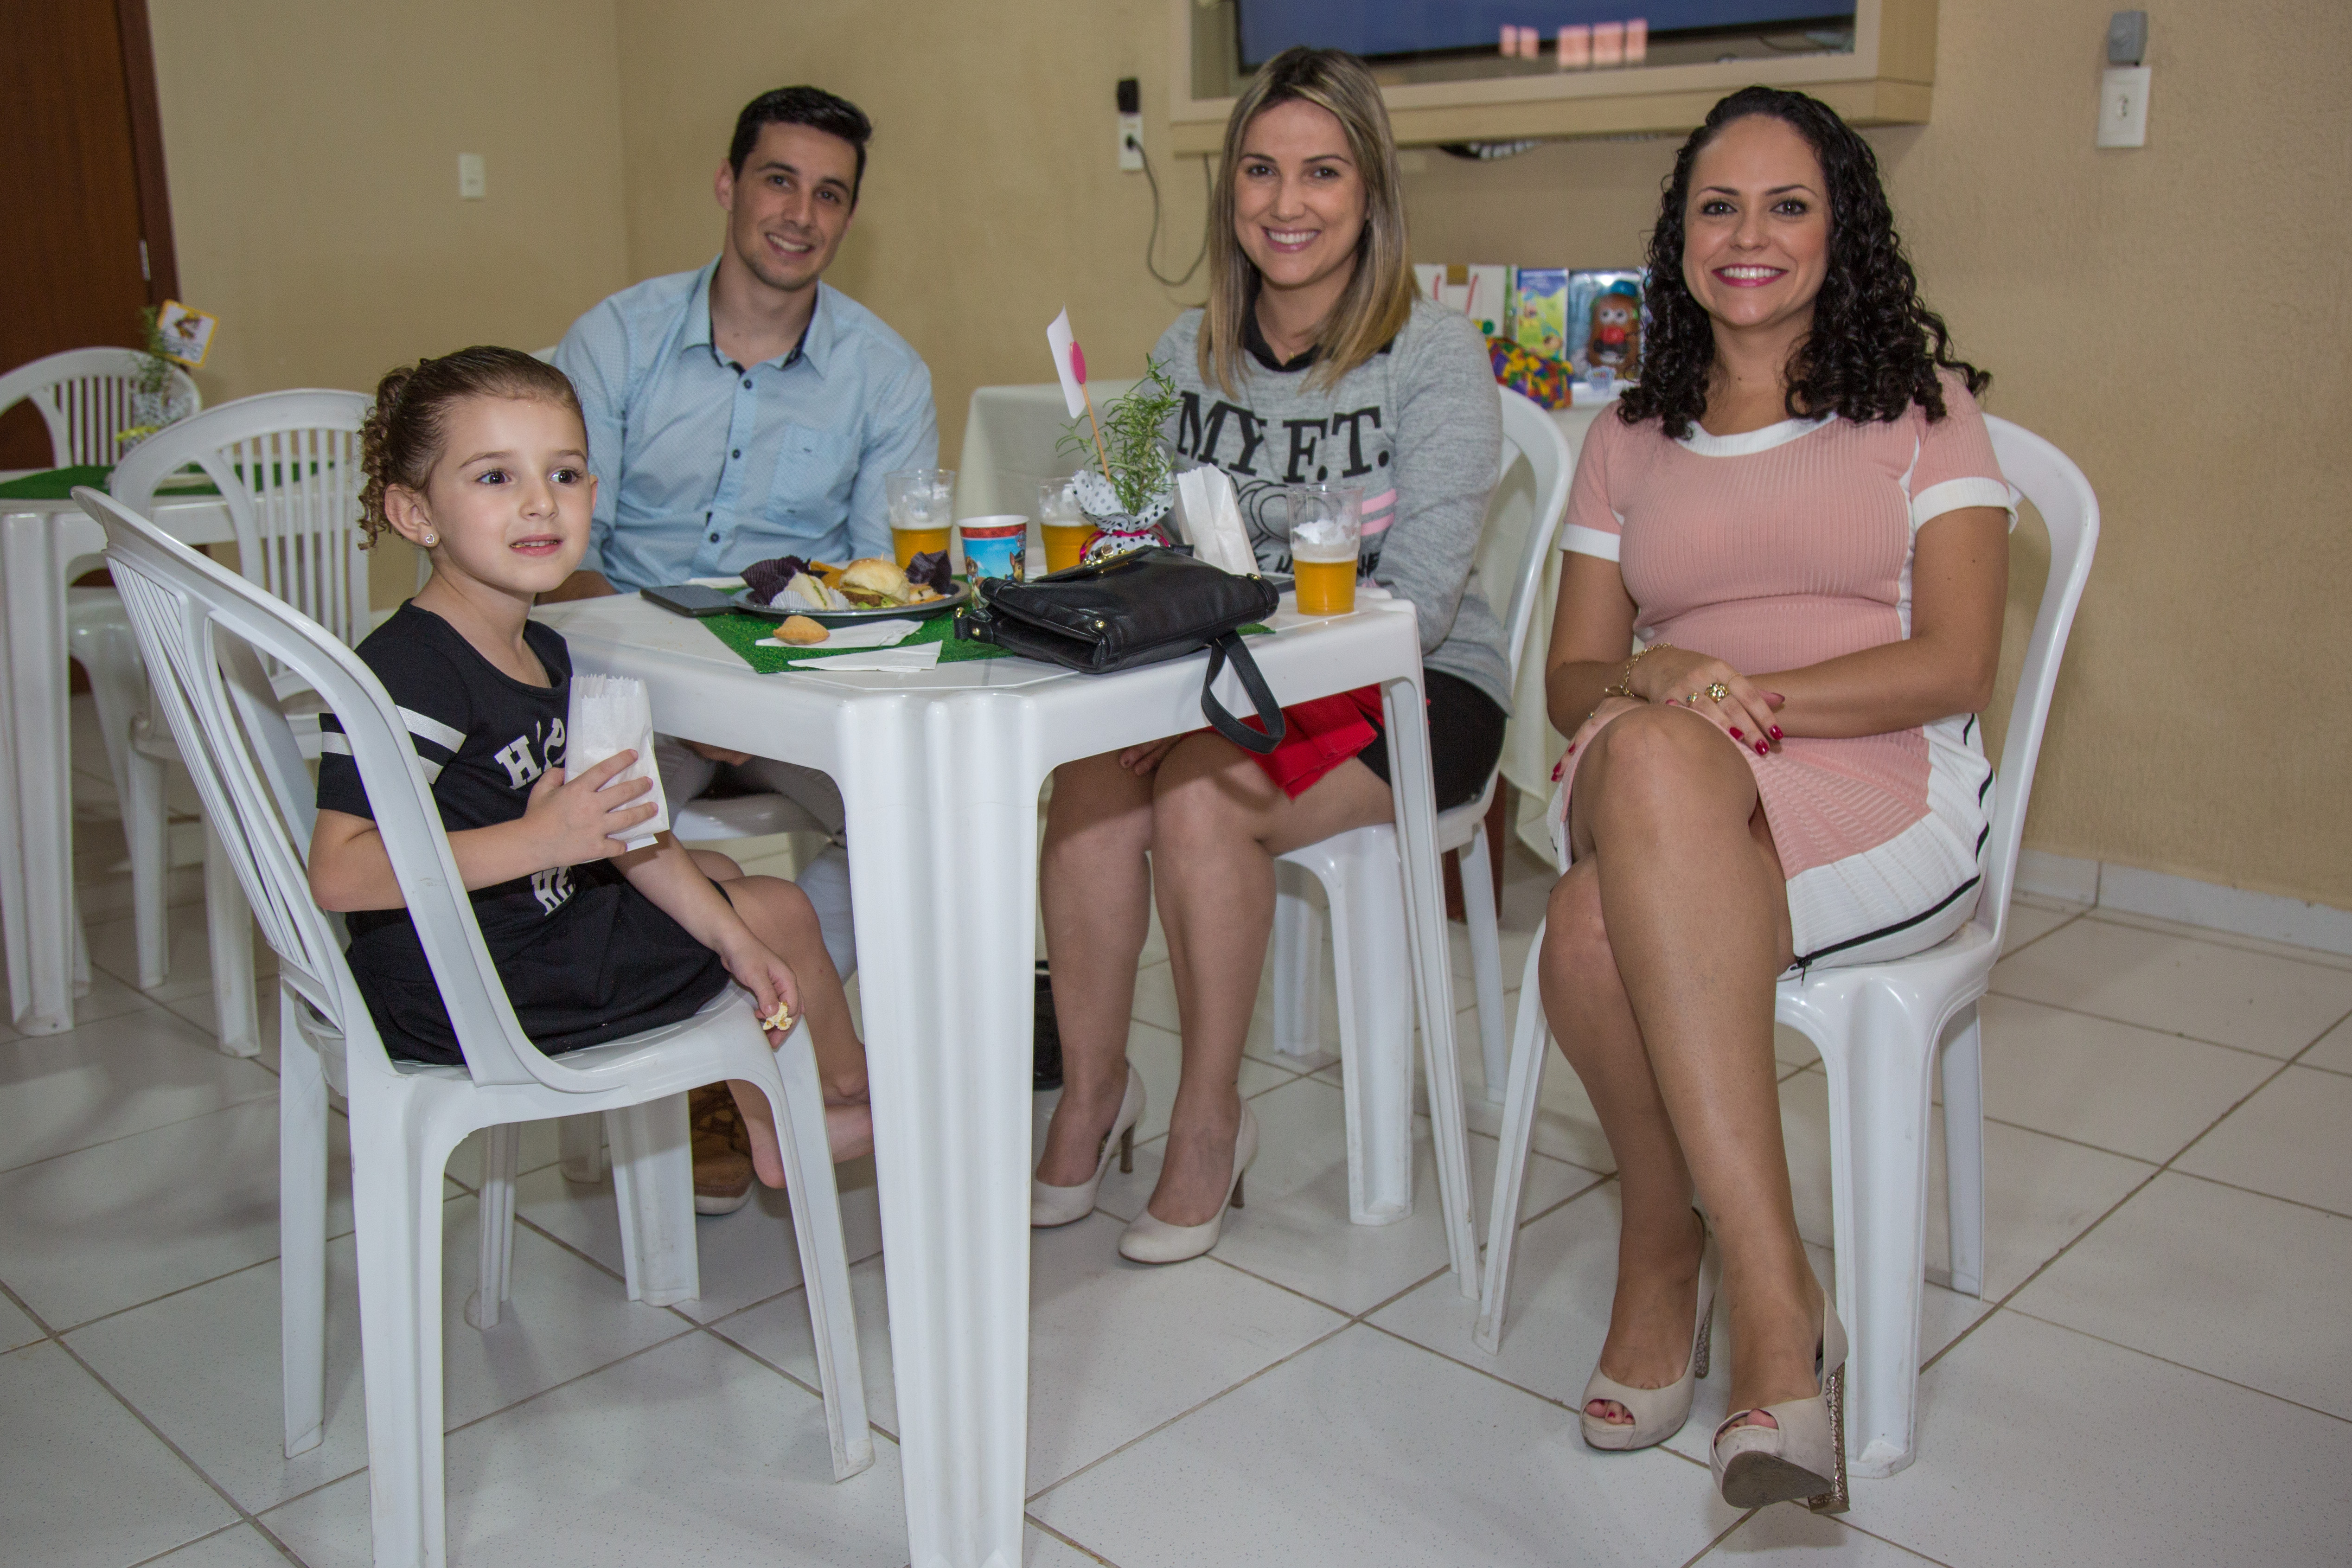 Festa‐Infantil‐Florianopolis‐Ana‐Marmo‐FotografiaFesta‐Infantil‐Florianopolis‐Ana‐Marmo‐Fotografia191A0468